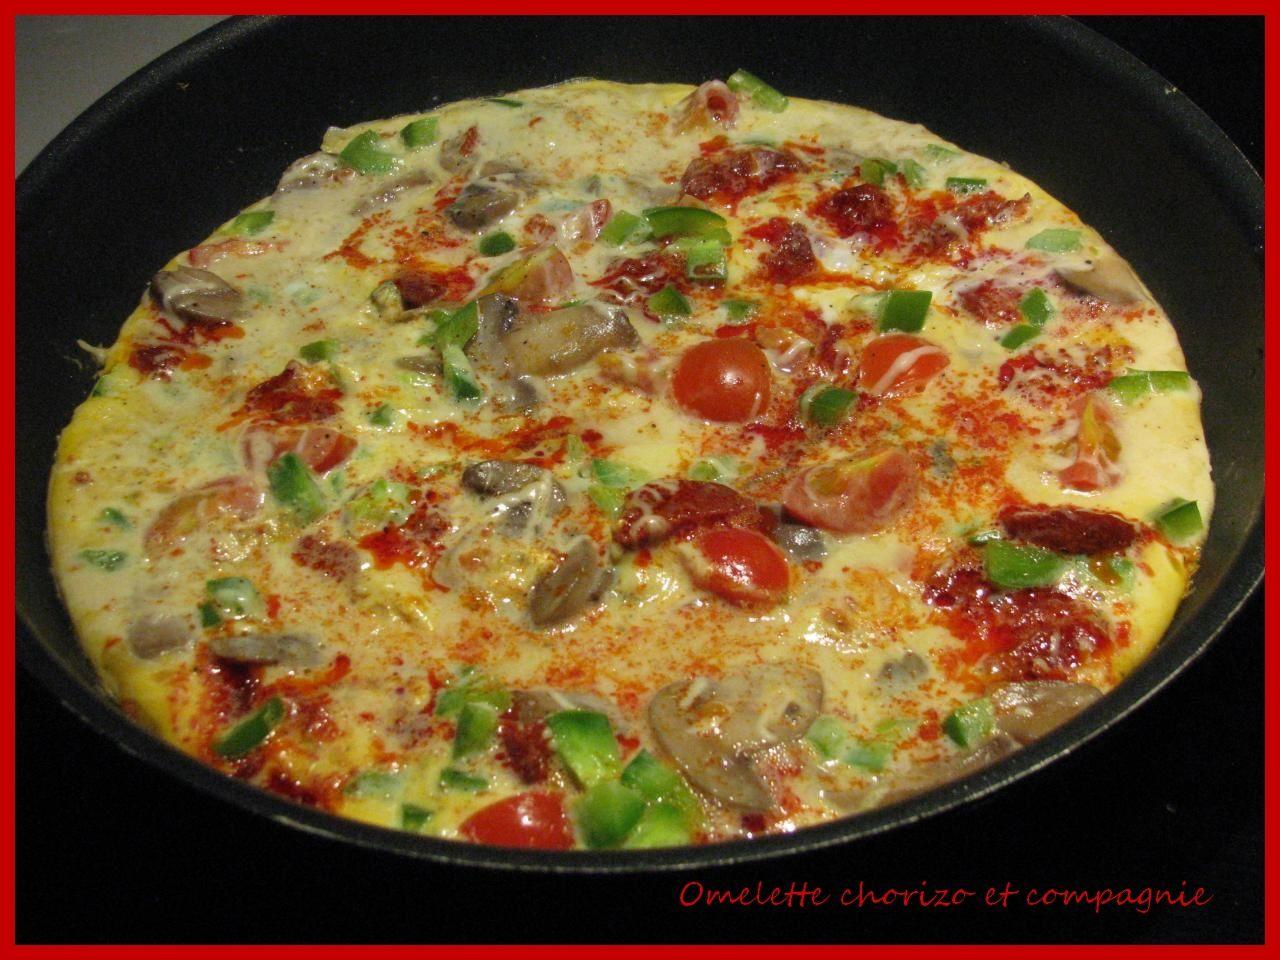 Omelette chorizo et compagnie